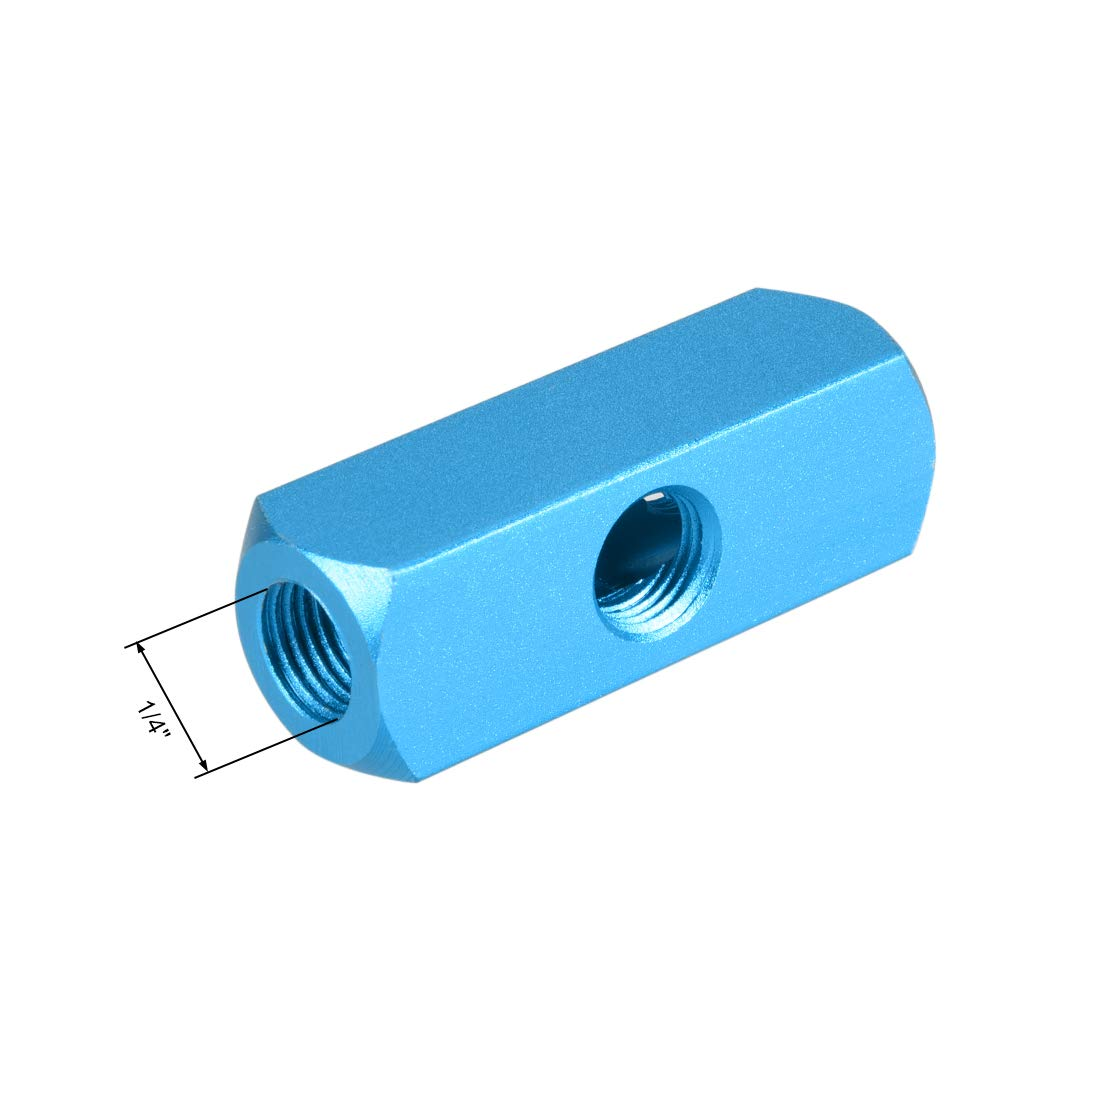 Uxcell a12082900ux0136 1//4 PT Thread 3 Way Quick Connect Air Hose Manifold Block Splitter